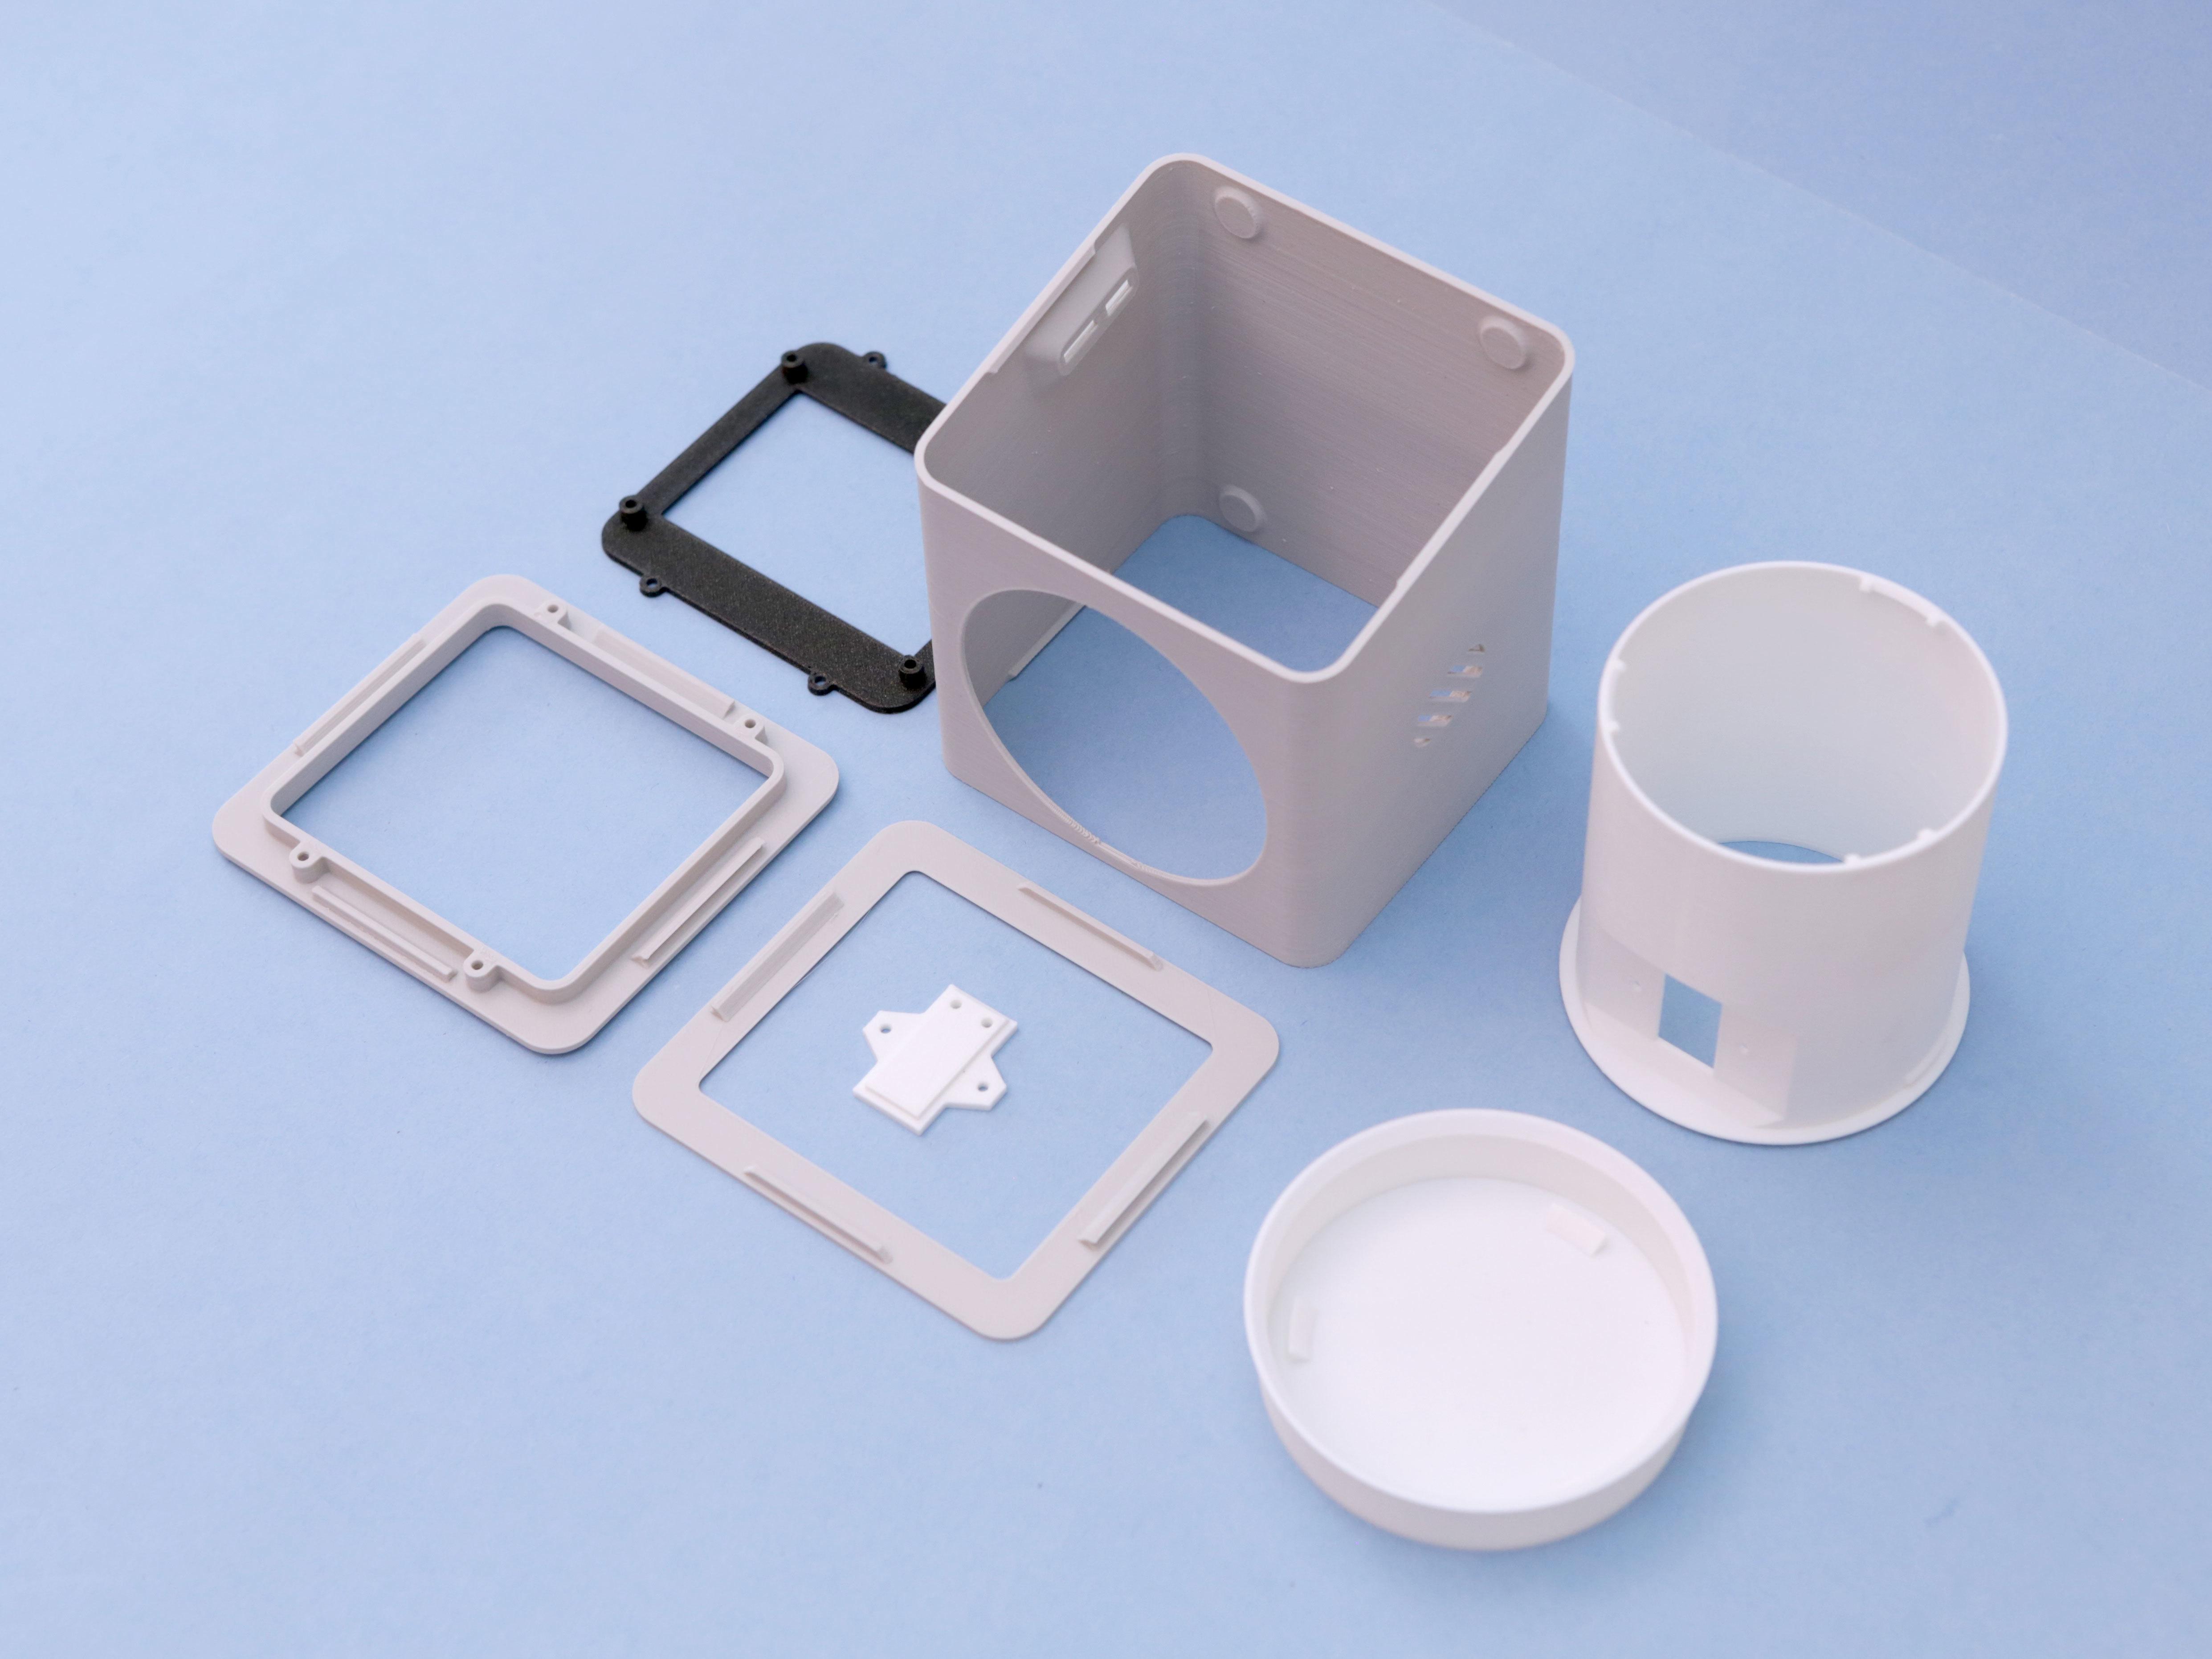 3d-parts.jpg Download free STL file IOT Smart Pet Planter • Template to 3D print, Adafruit